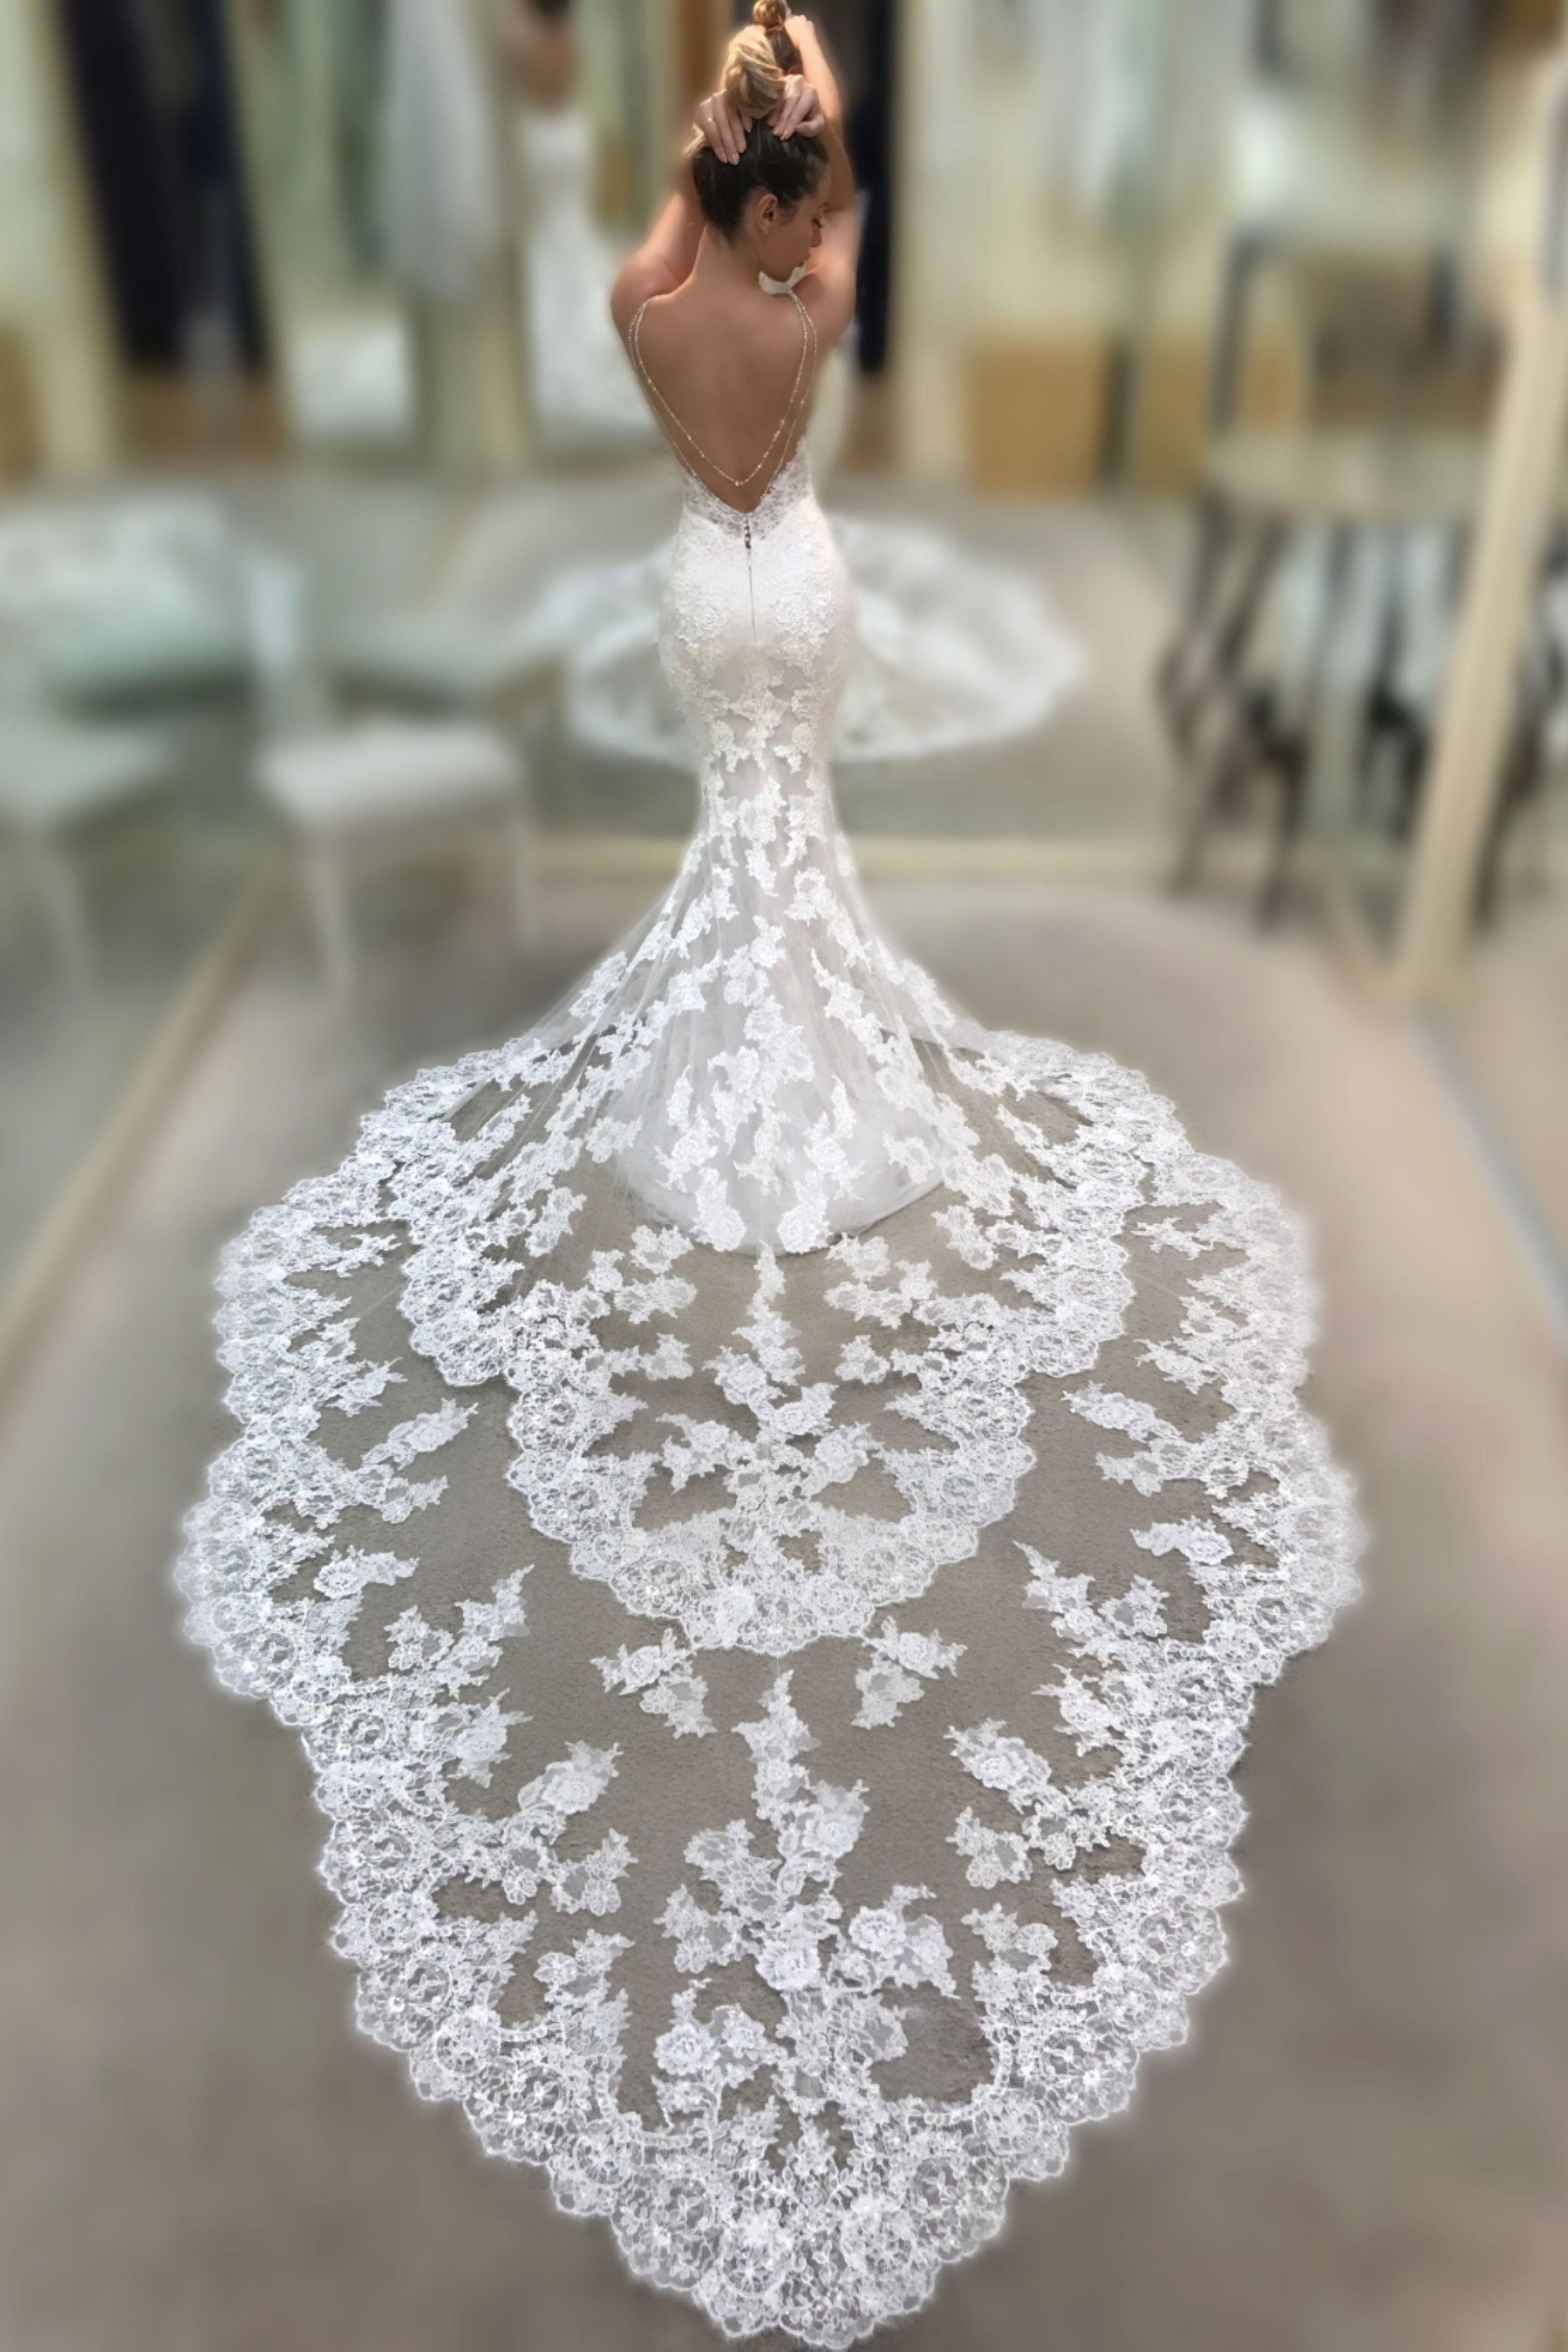 20 Stunning Trumpet Mermaid Wedding Dresses Enzoani Wedding Dresses Princess Wedding Dresses Backless Wedding [ 4536 x 3024 Pixel ]